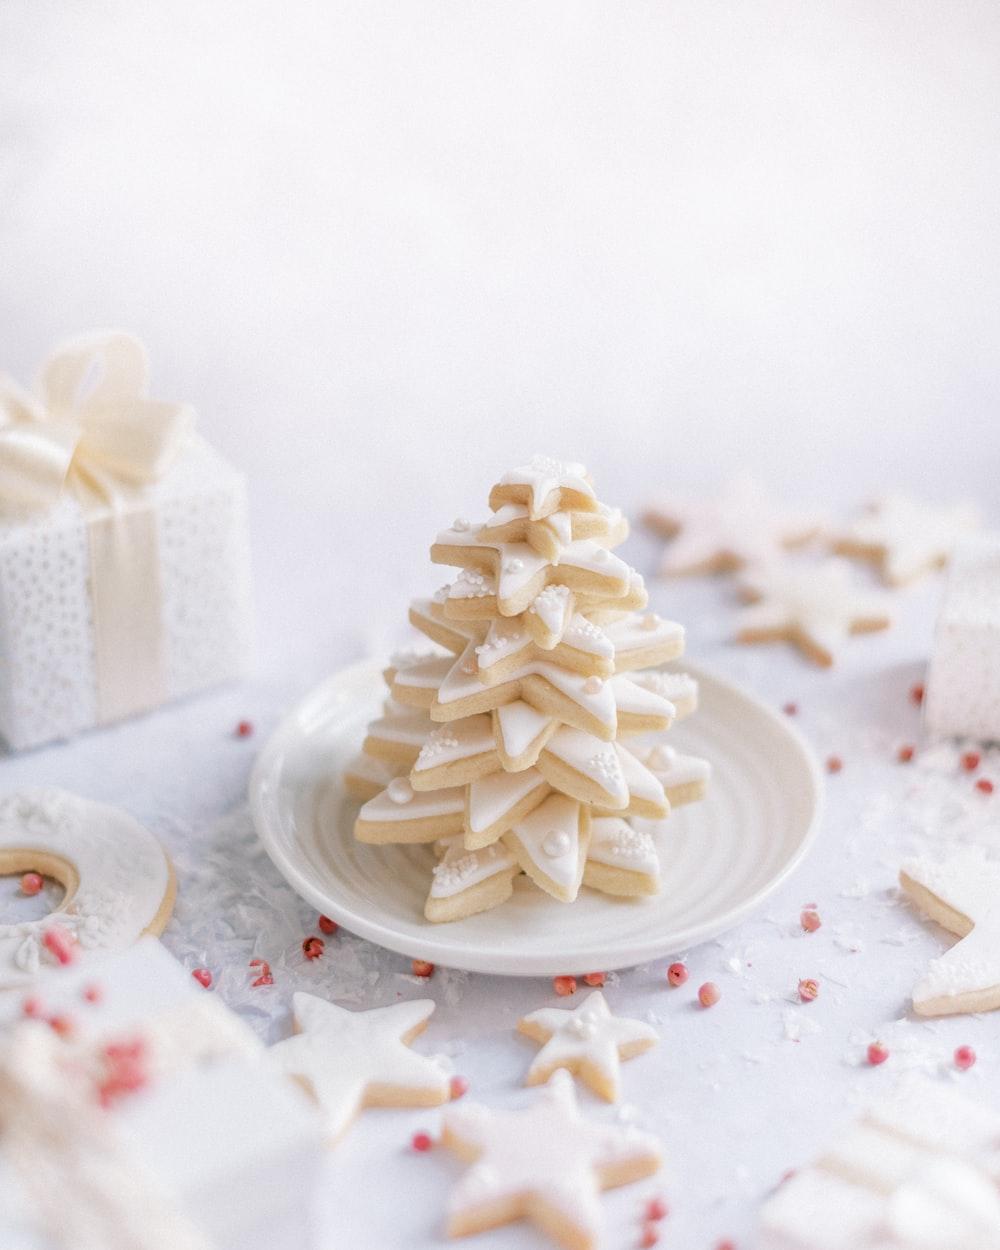 white ice cream on white ceramic plate